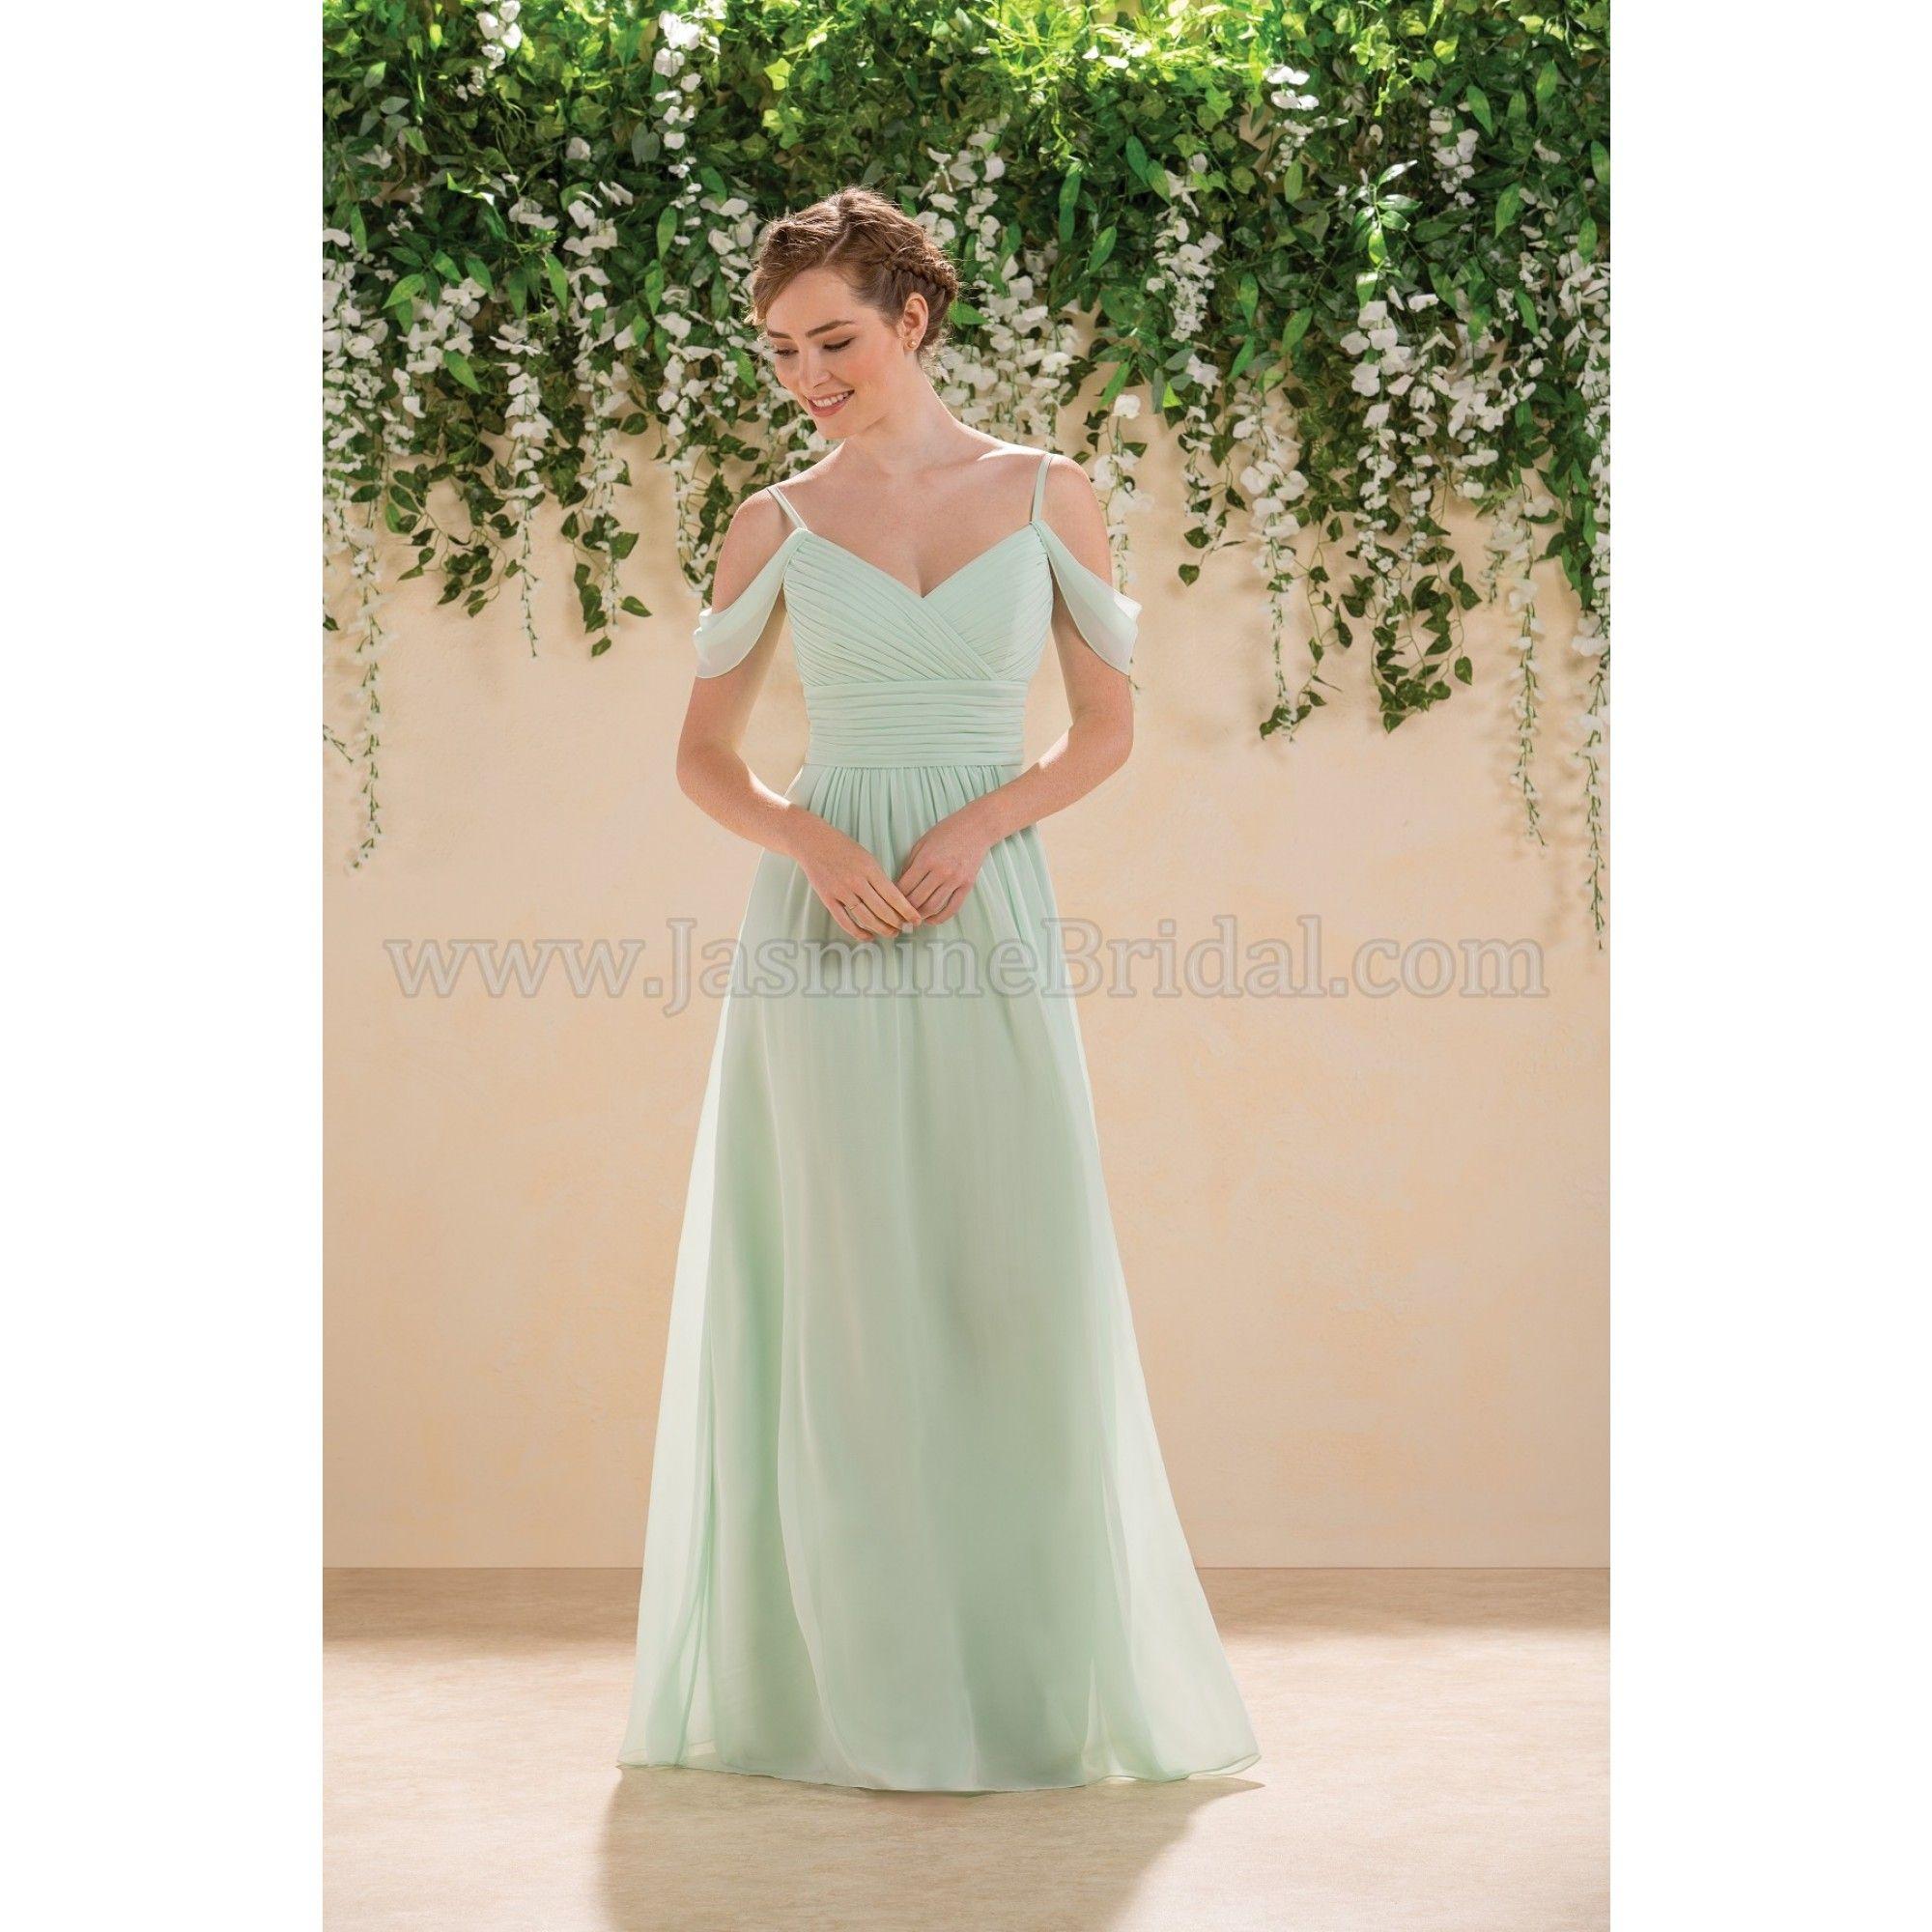 B2 183005b2 bridesmaid dress b183005 oh weddings i love jasmine bridal bridesmaid dress style in seamist green ombrellifo Images